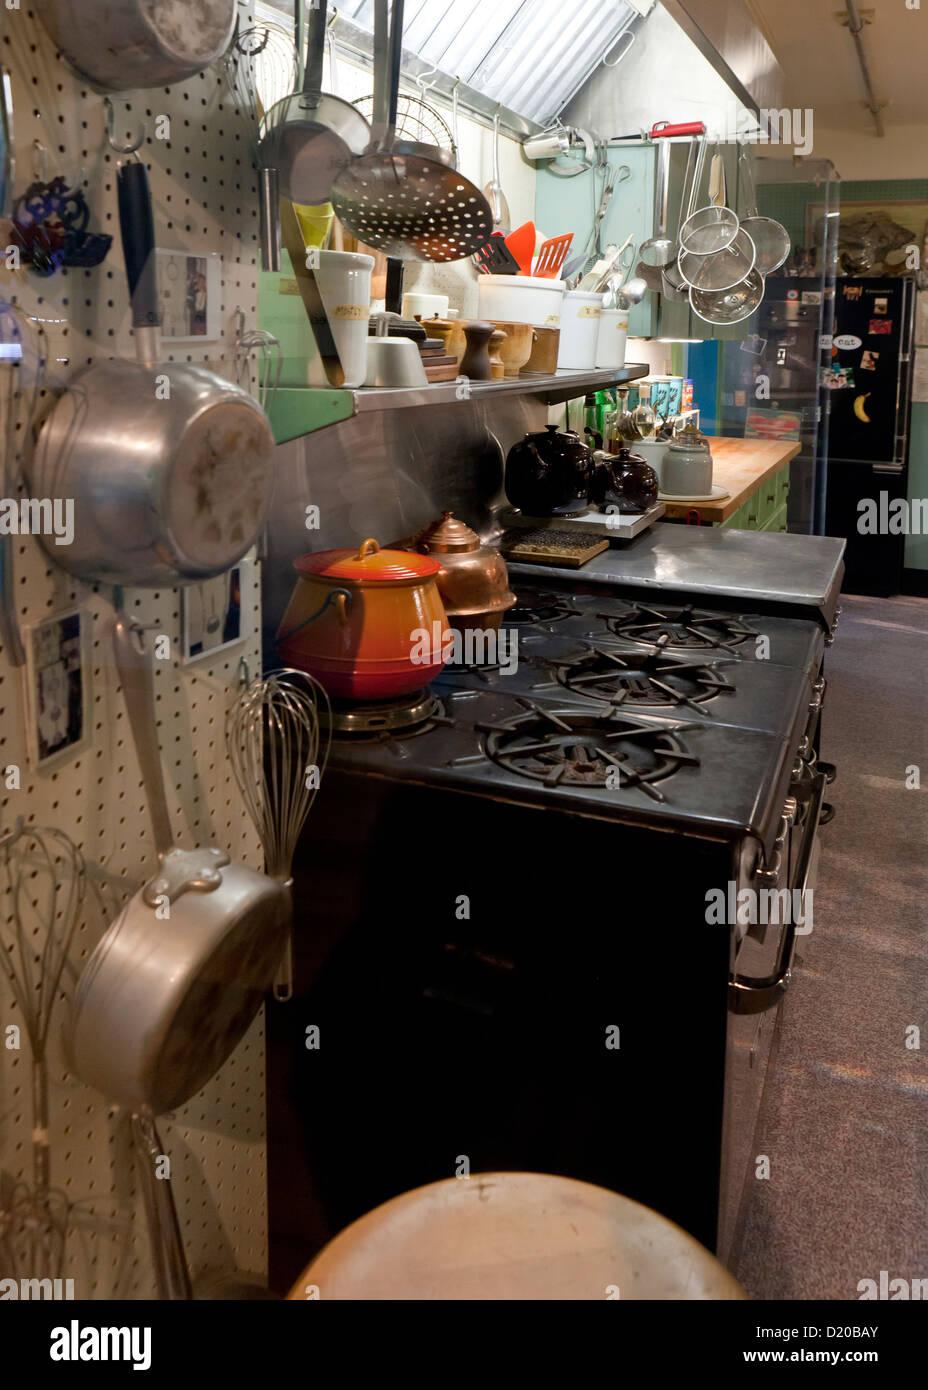 Vintage kitchen oven - Stock Image